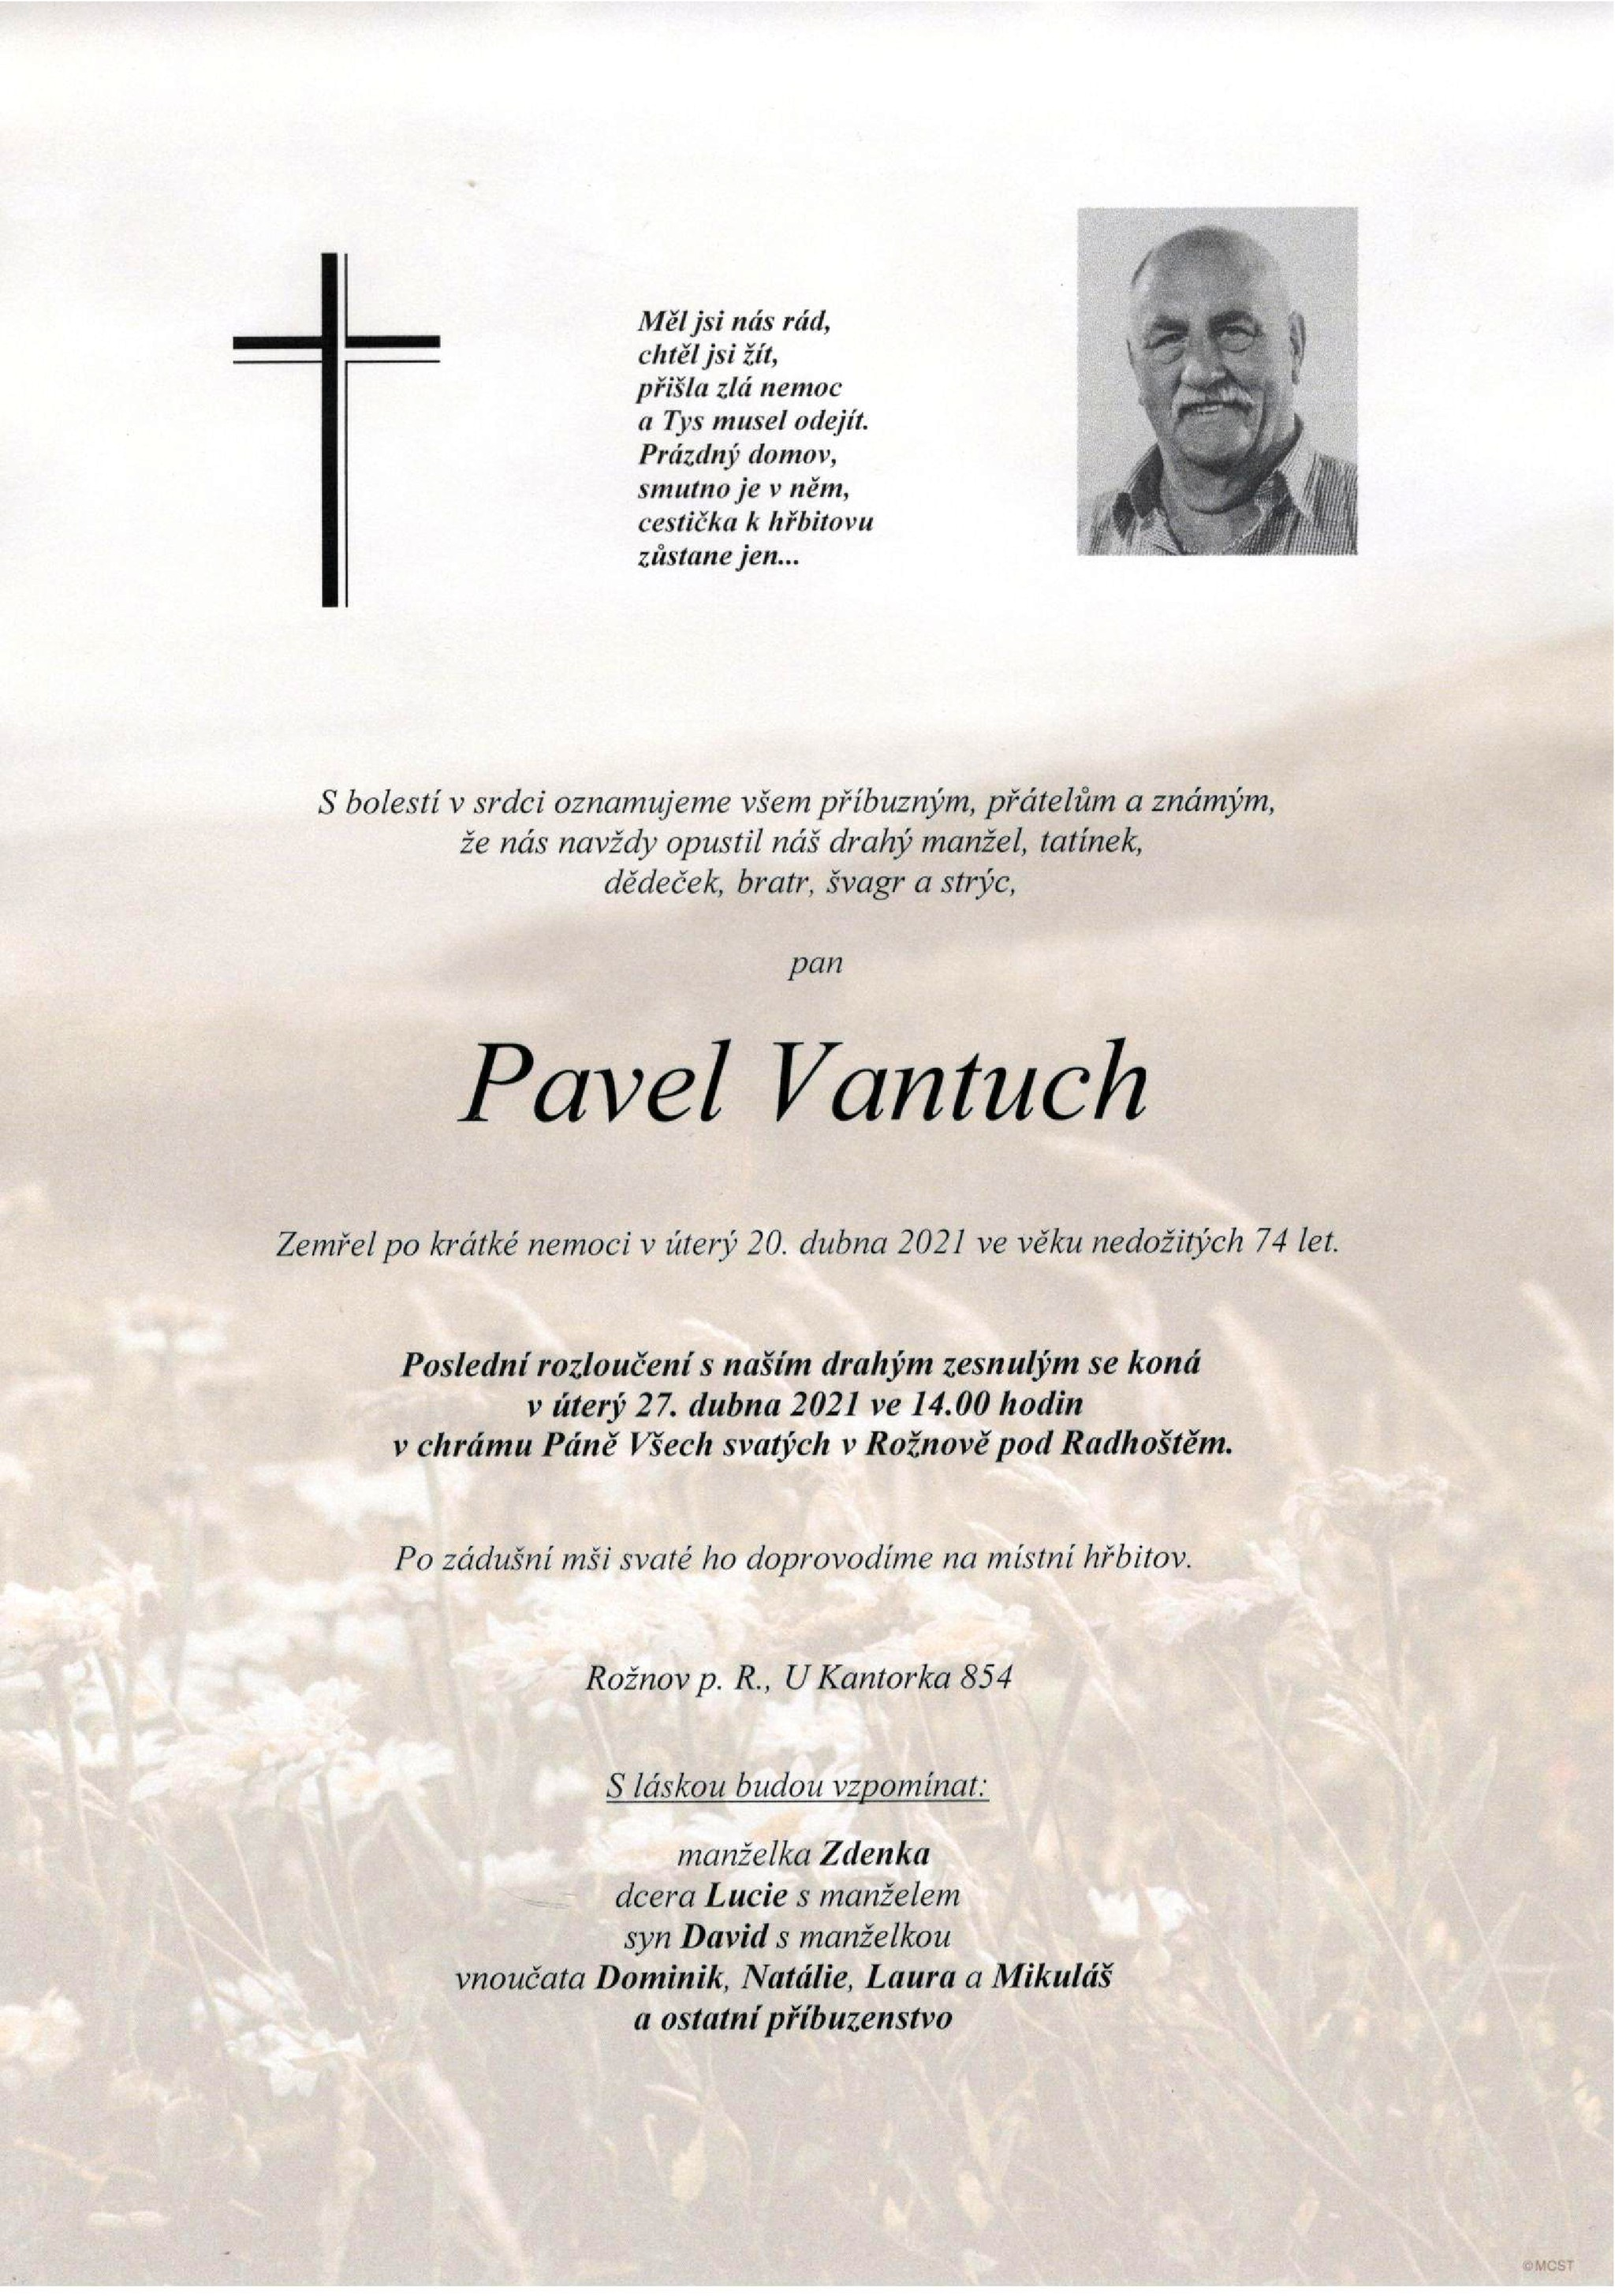 Pavel Vantuch